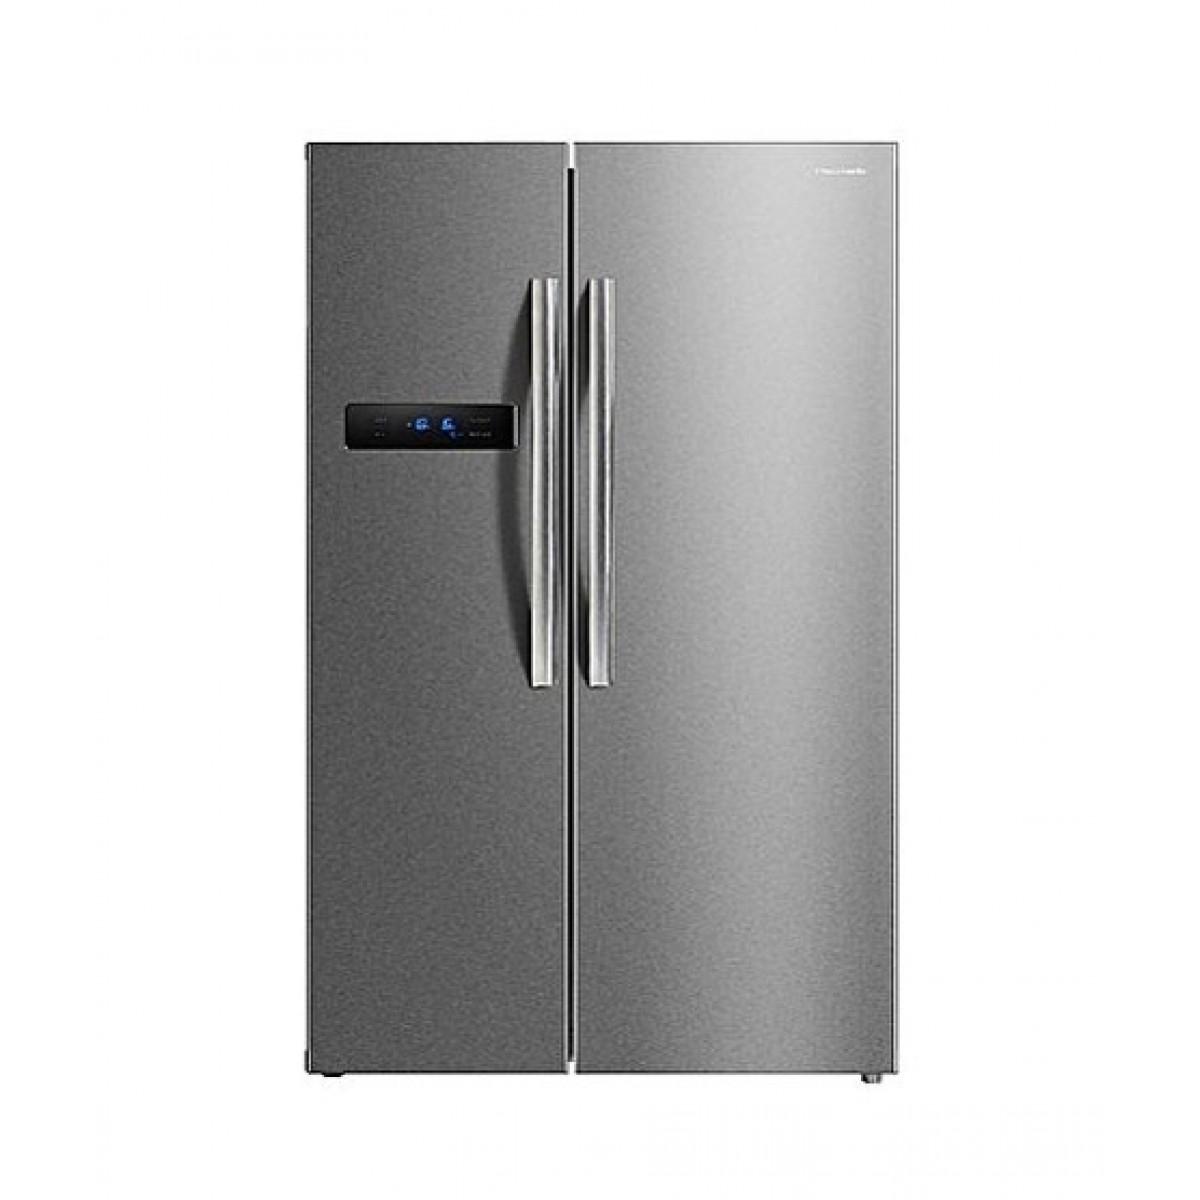 Panasonic Side-By-Side Refrigerator 600L (NR-BS60MS)